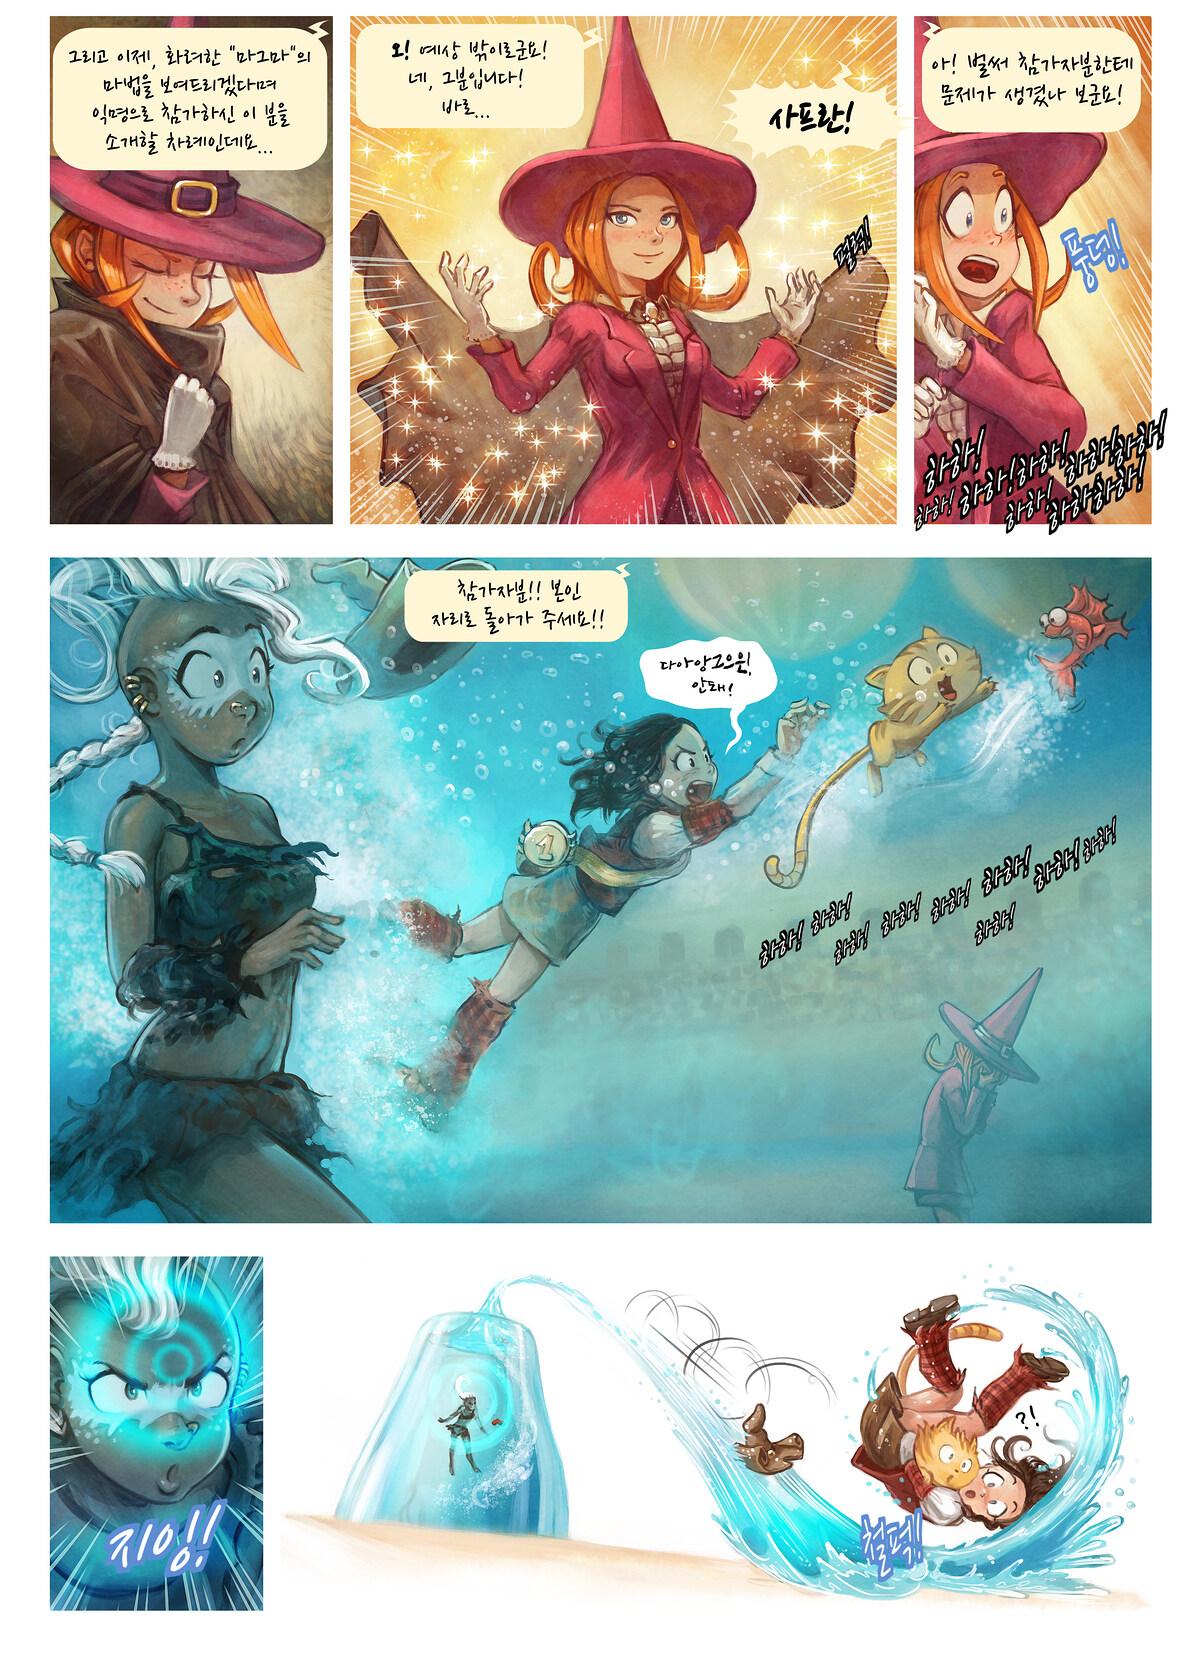 A webcomic page of Pepper&Carrot, 에피소드 21 [kr], 페이지 6